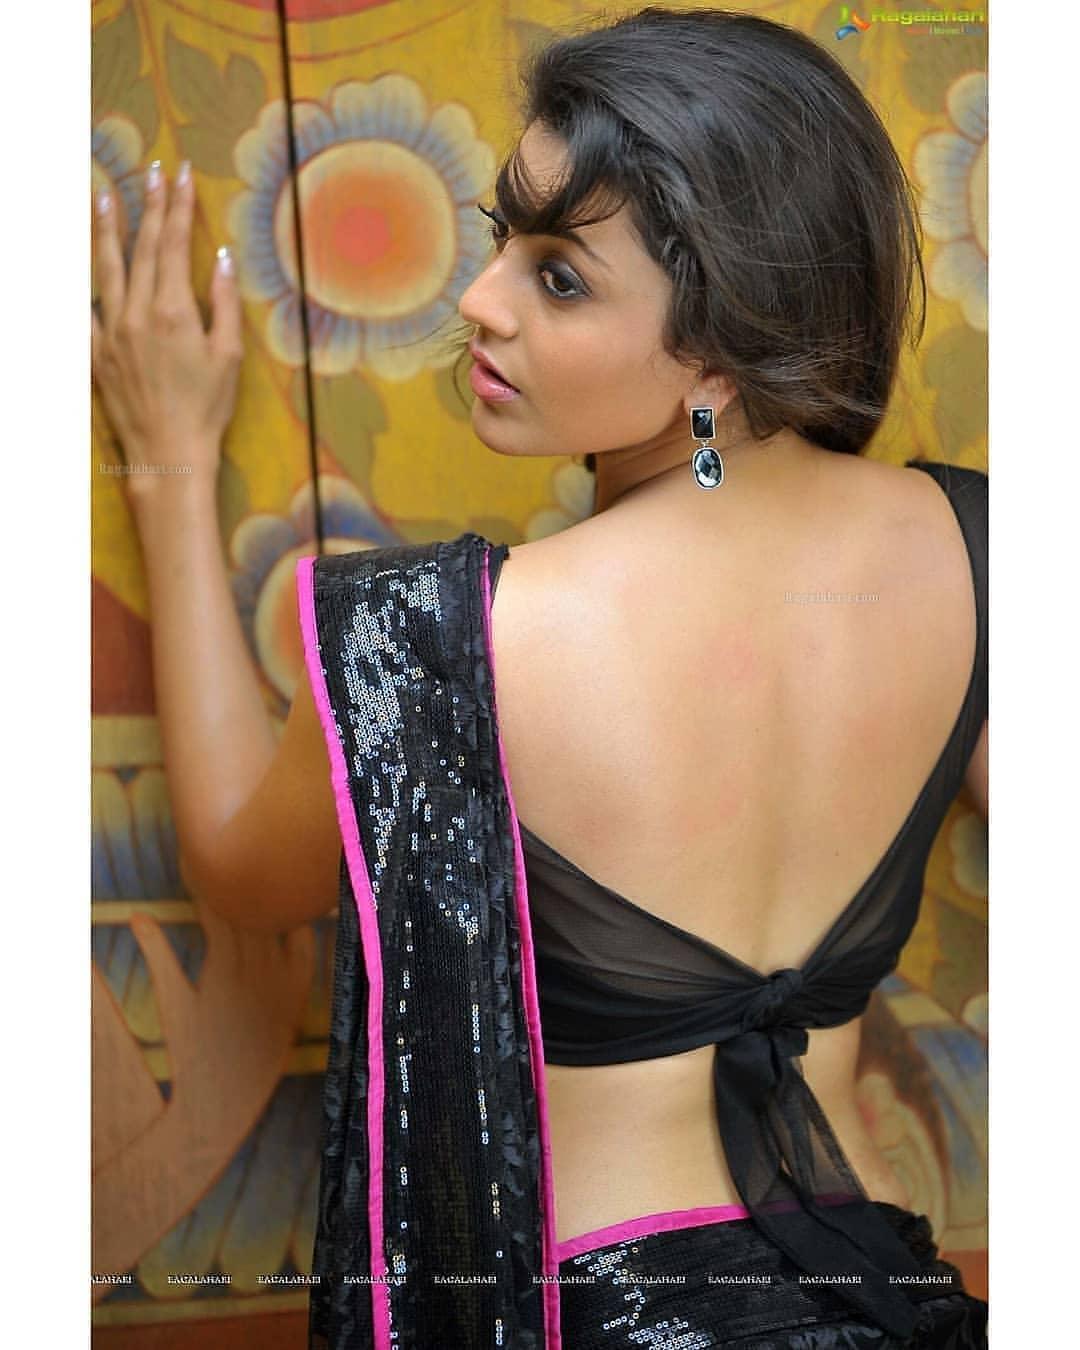 Kajal Agarwal 1080p 2k 4k 5k Hd Wallpapers Free Download Bollywood Vibe